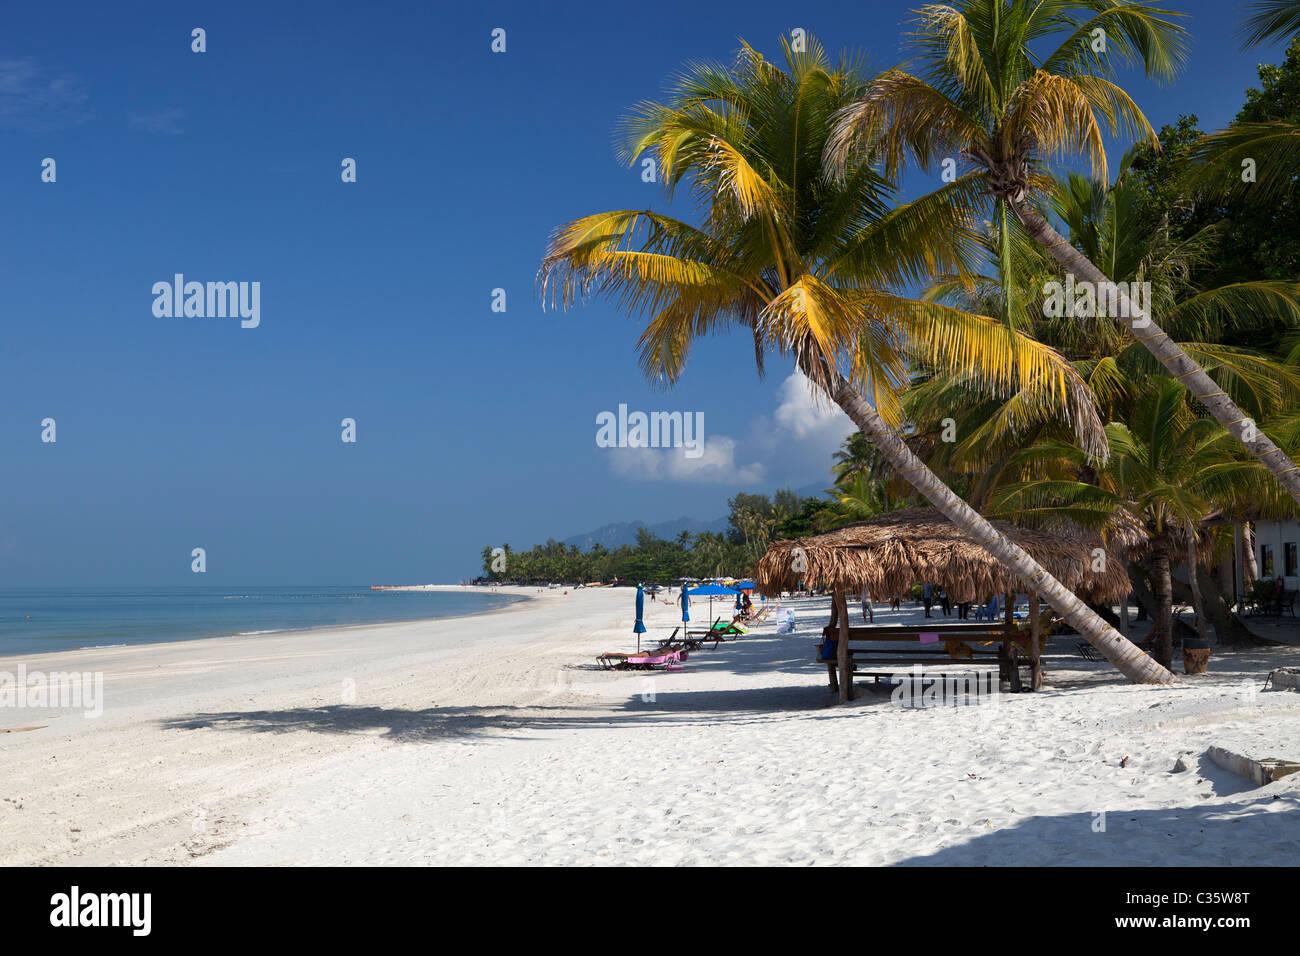 Dream tropical beach at Pantai Cenang on Langkawi, Malaysia 16 - Stock Image